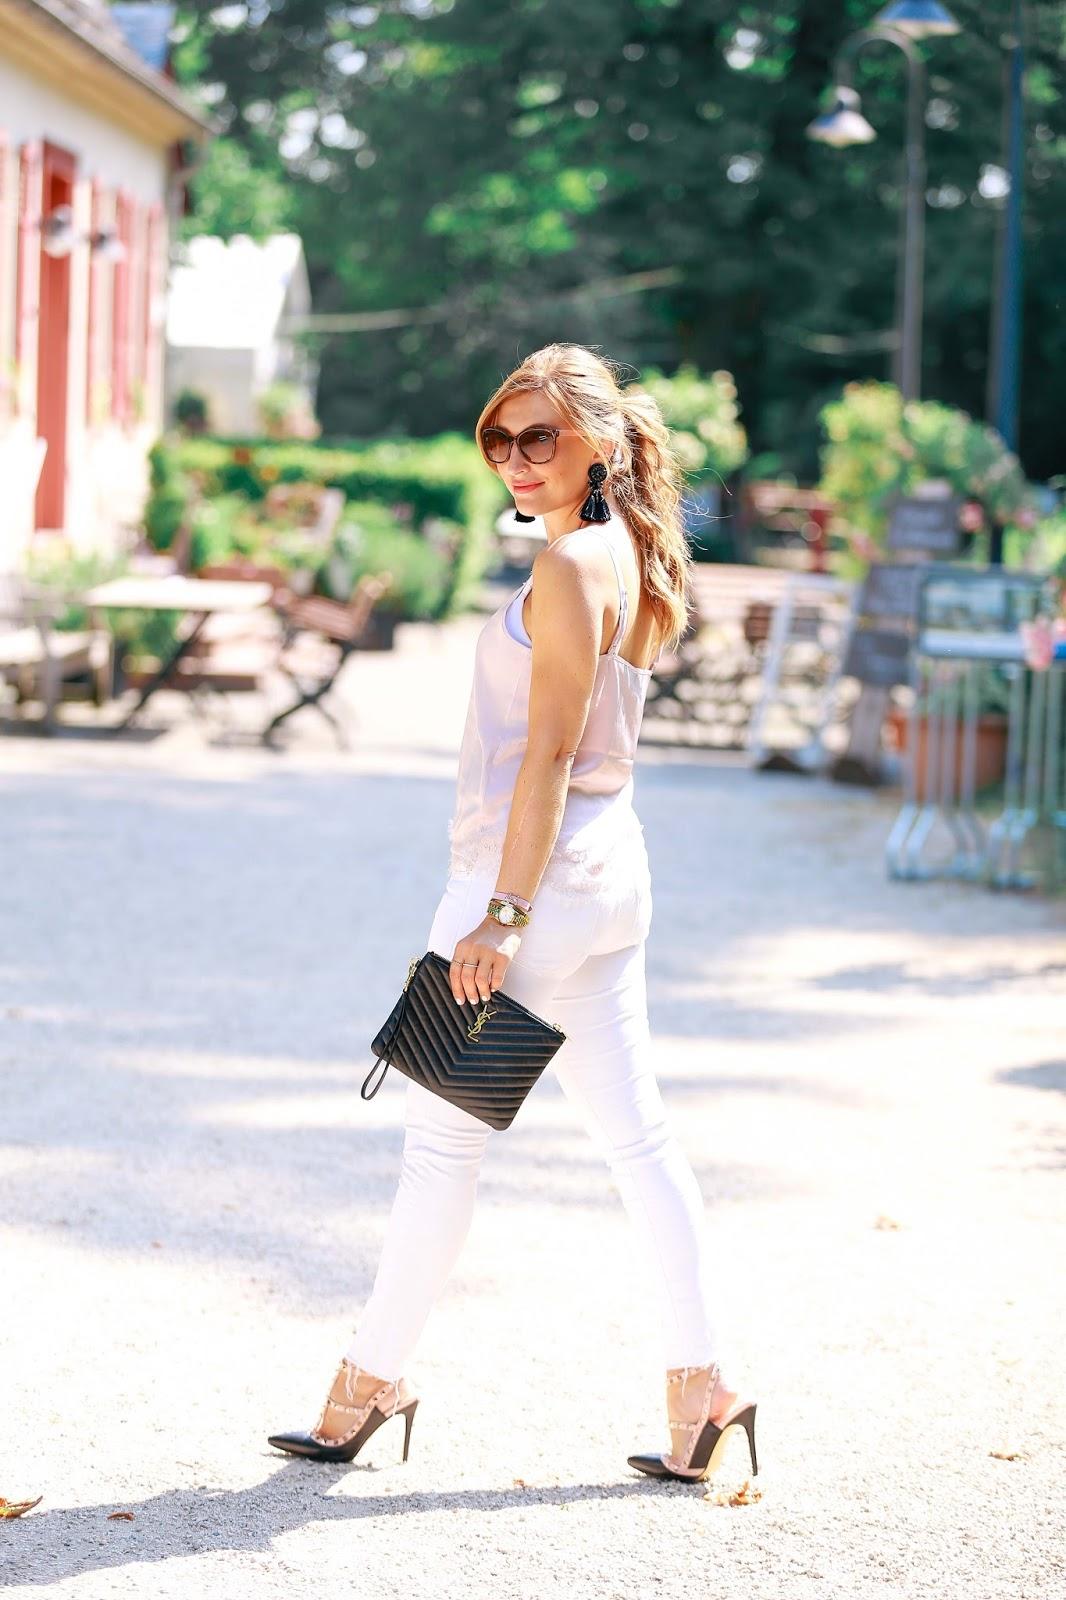 fashionblogger-Fashionblogger-Frankfurt-Main-Modeblog-Alte-Oper